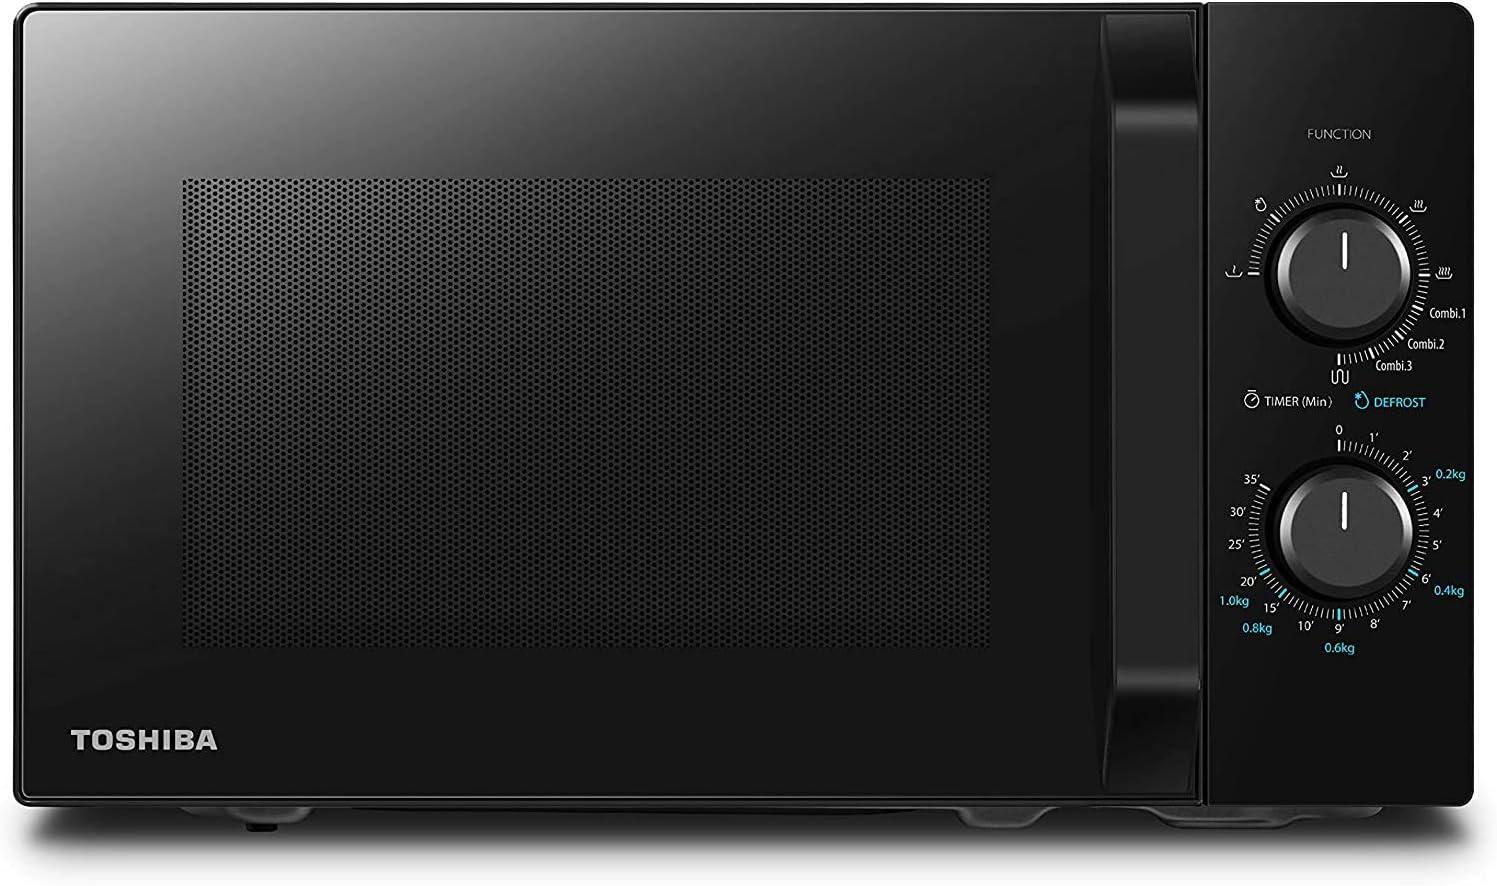 Toshiba MW2- AG23PF - Horno de microondas con grill y cocción combinada, 23 L, 8 menús fáciles, plato giratorio con memoria de posición, 900 W, grill 1050 W, 48,5 x 40,3 x 29,6 cm, negro